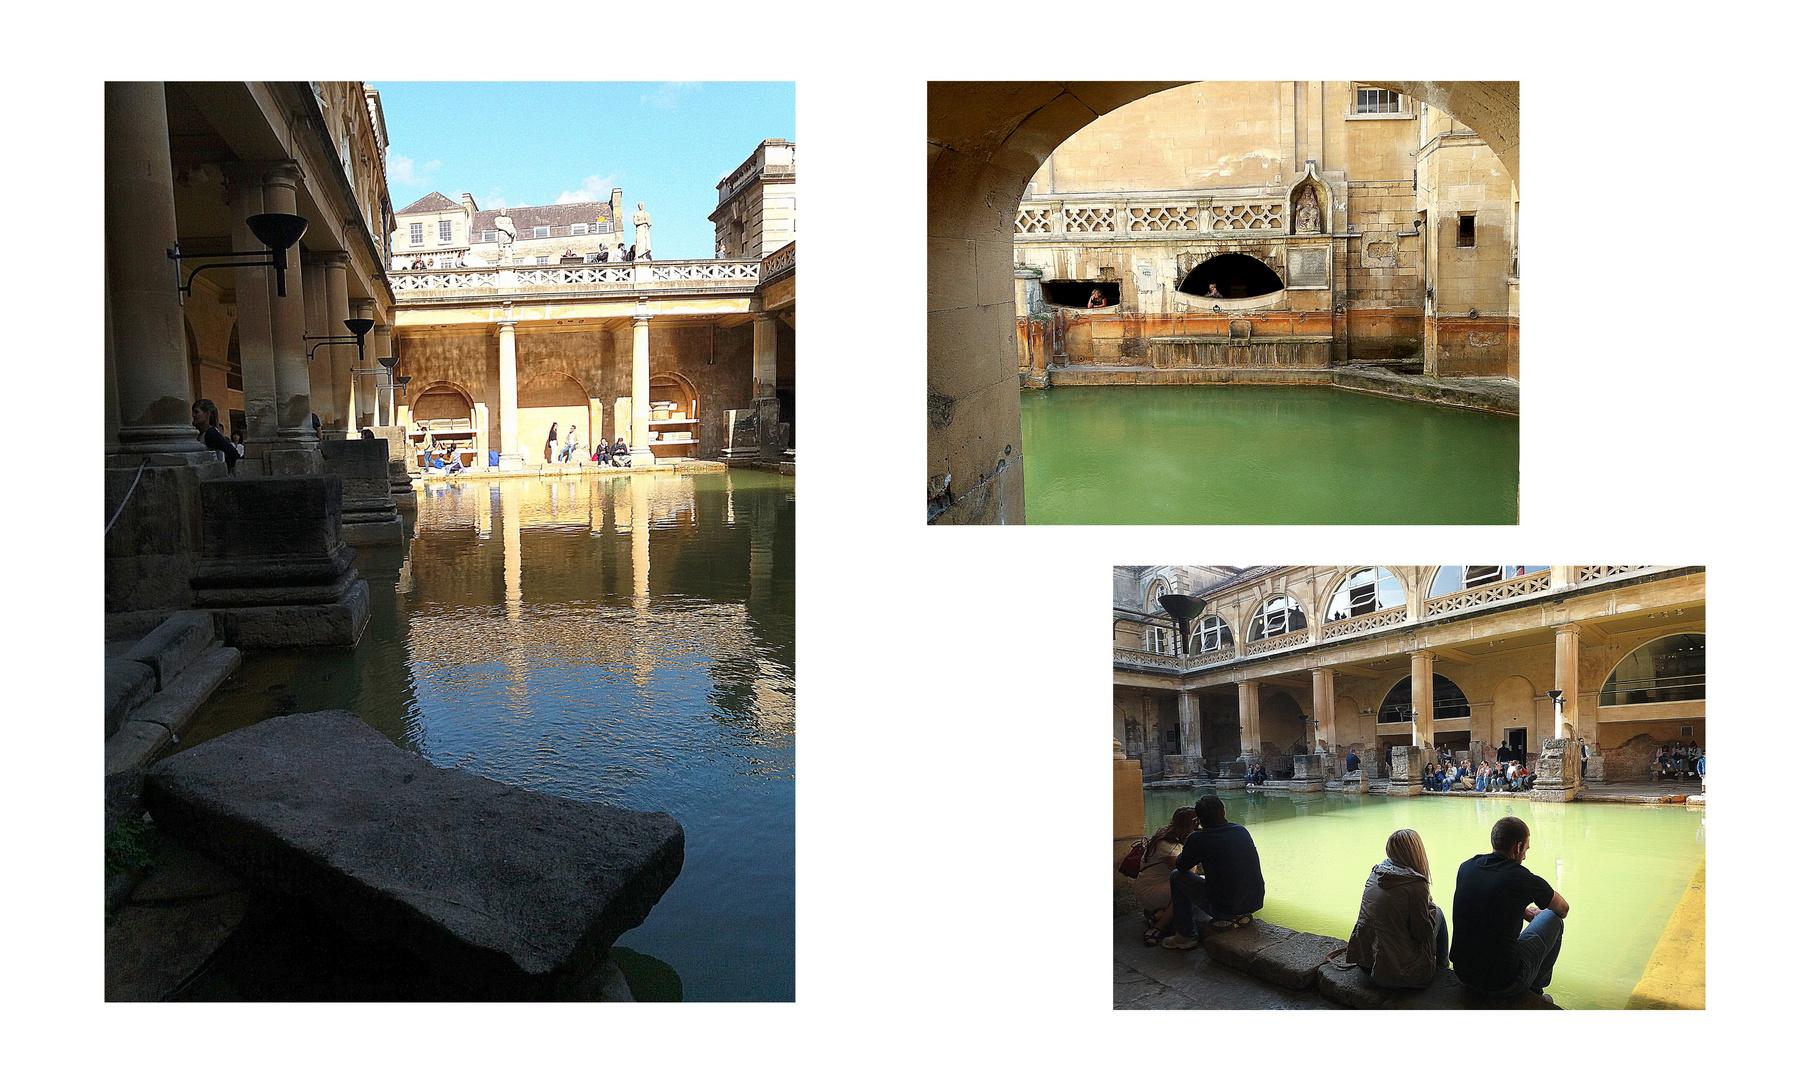 Bath...le terme romane...